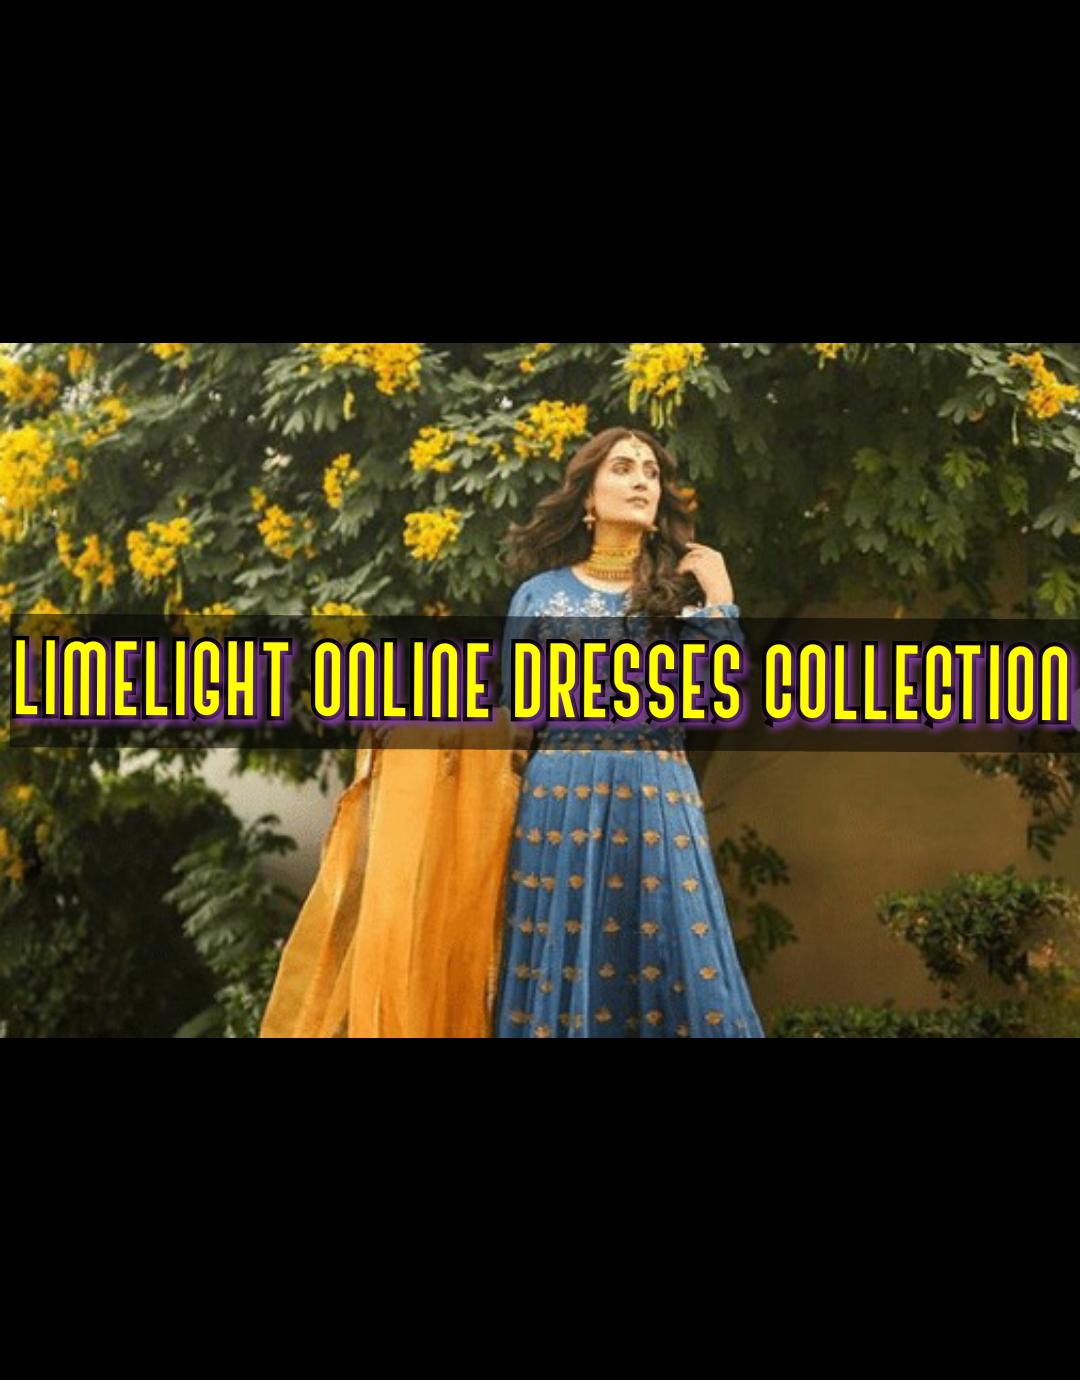 limelight online